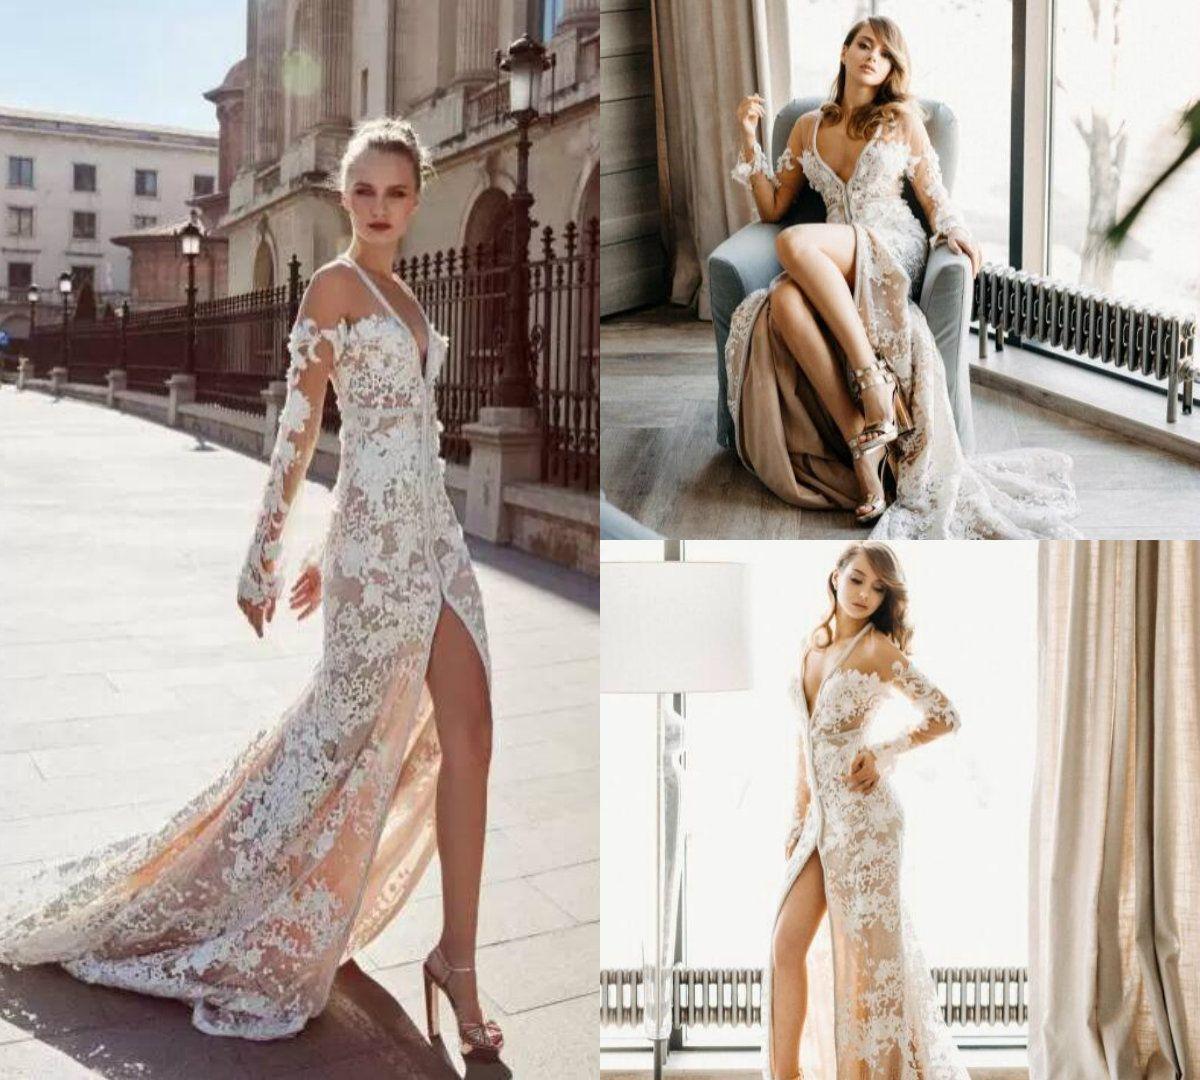 43fd62bca743 Discount 2018 Mermaid Wedding Dresses Deep V Neck Lace Applique High Split  Sweep Train Sexy Boho Wedding Gowns Beading Long Sleeve Bridal Dress Lace A  Line ...